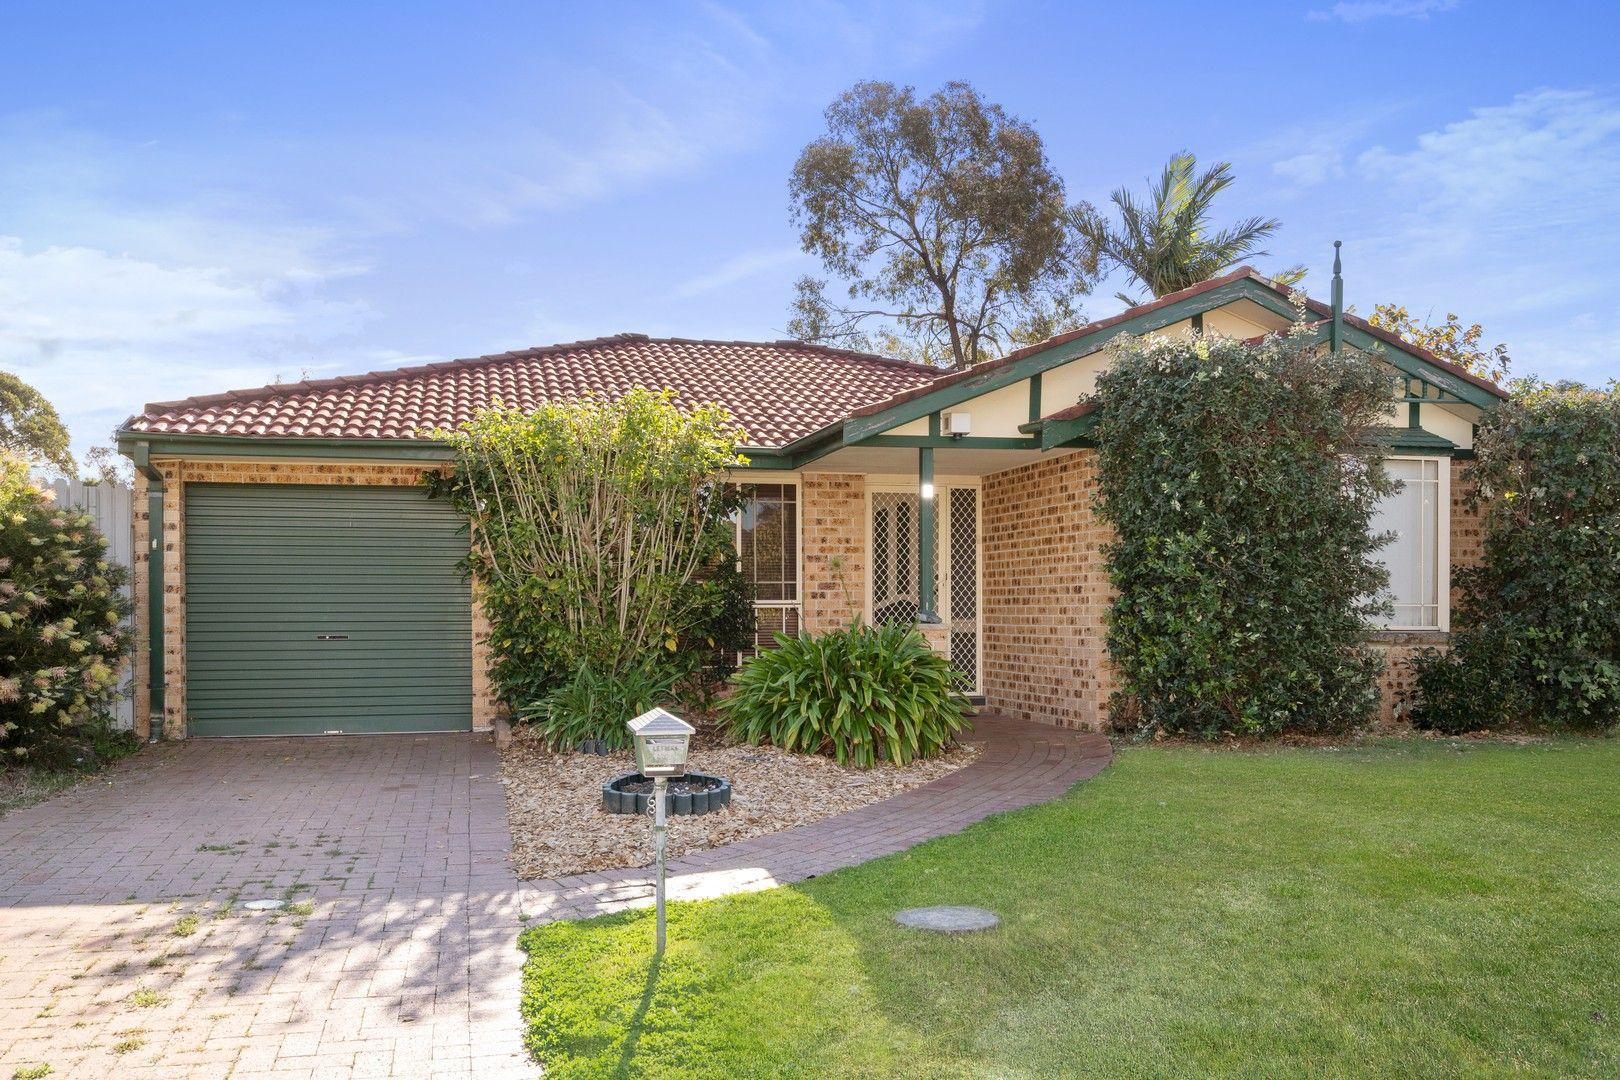 6 Corrin Court, Wattle Grove NSW 2173, Image 0